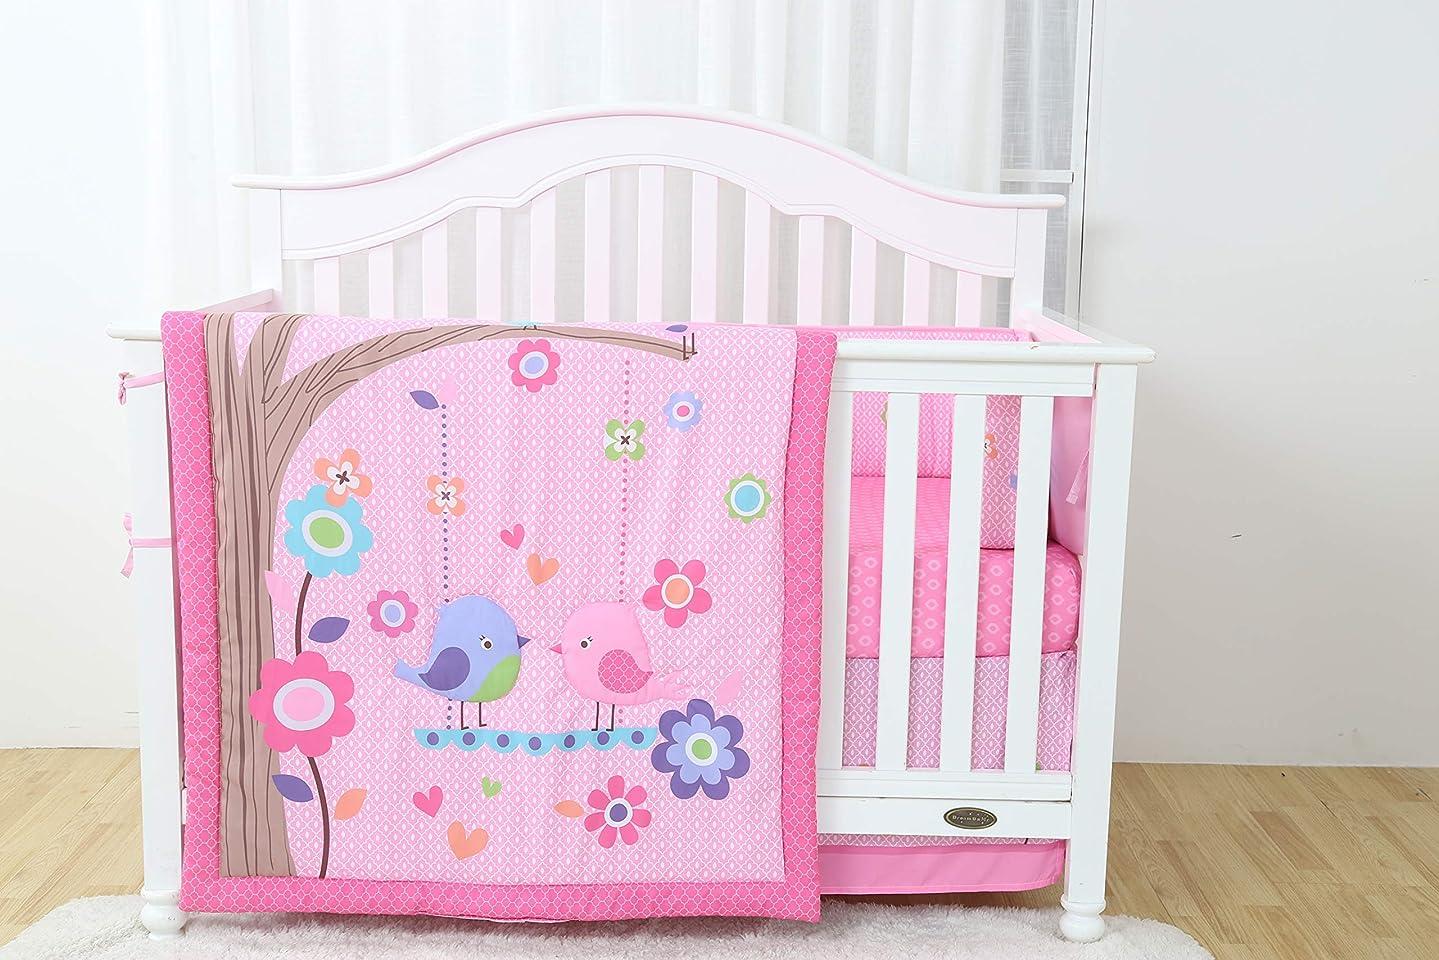 California Drapes 4PC Crib Bedding Set, 1 Comforter, 1 Bumper, 1 Fitted Sheet & 1 Dust Ruffle - Love Birds